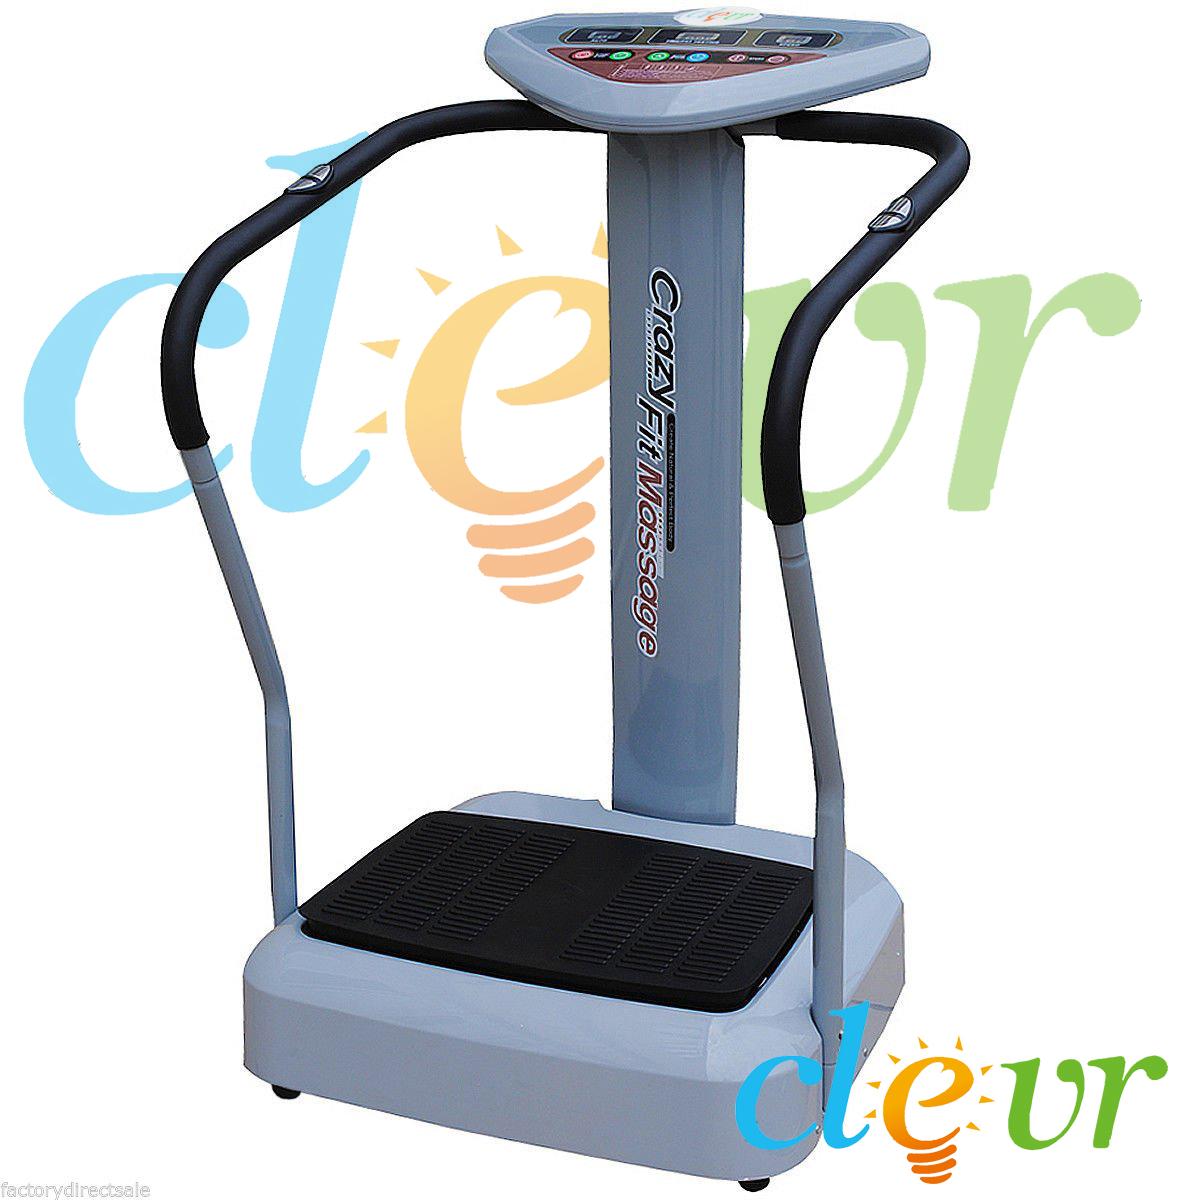 1000w pro crazy fit full body vibration massage machine platform massage fitness ebay. Black Bedroom Furniture Sets. Home Design Ideas